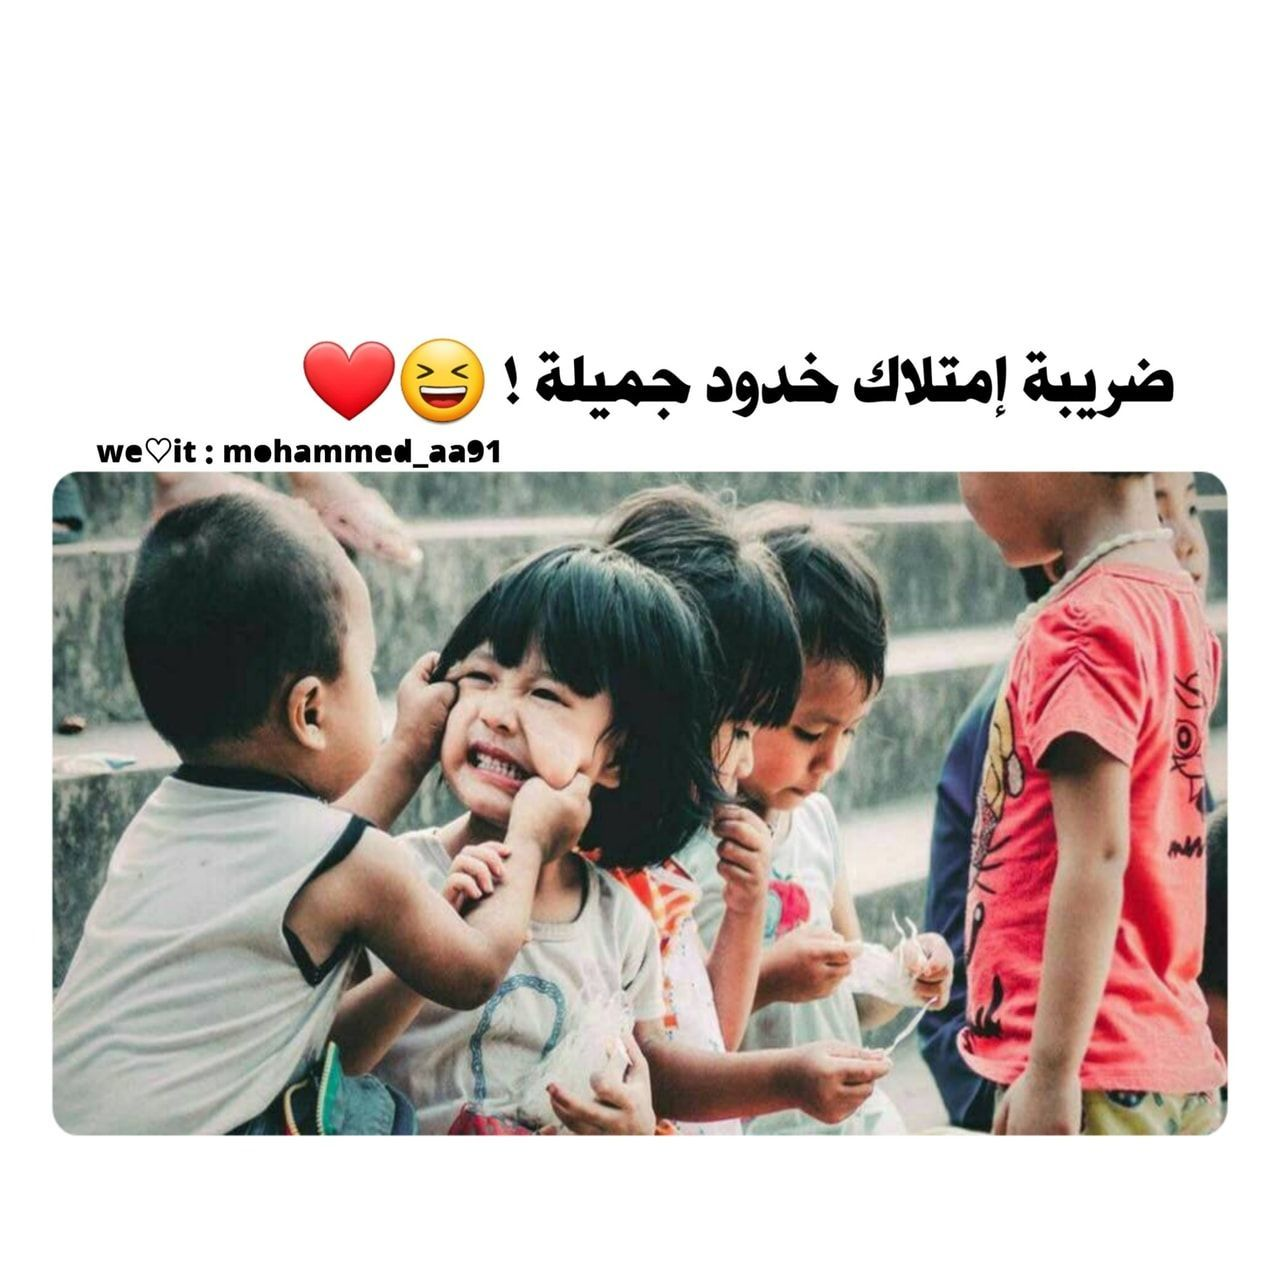 ثورة أكتوبر العراقيه Funny Picture Jokes Fun Quotes Funny Funny Photo Memes